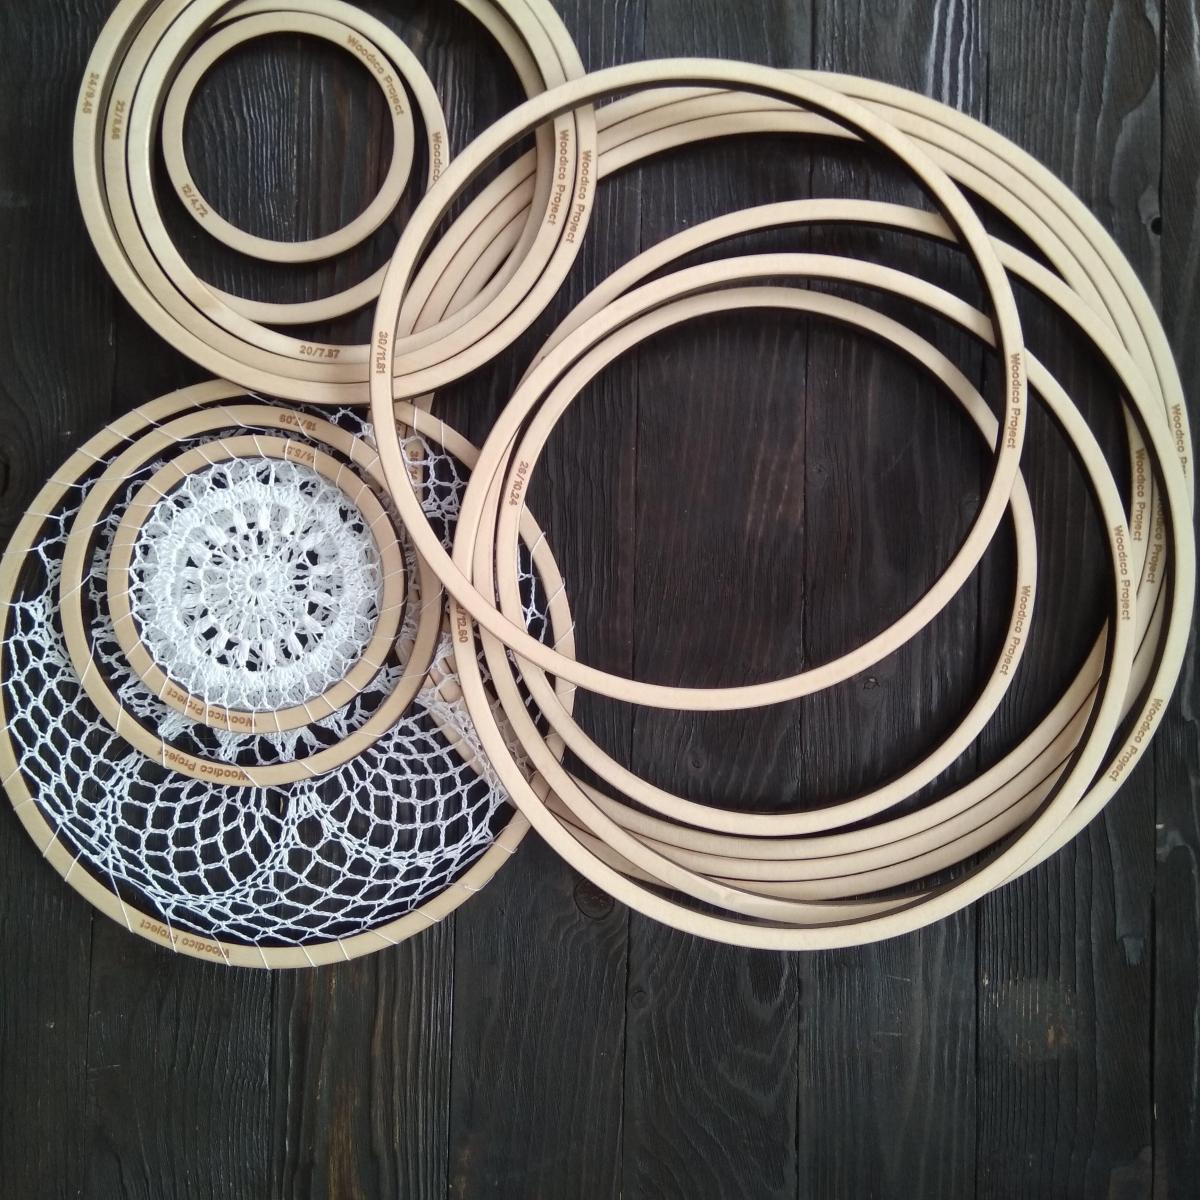 woodico.pro dream catcher base set of 15 rings 12 40 cm 1 1200x1200 - Dream catcher base / Set of 15 rings 12-40 cm